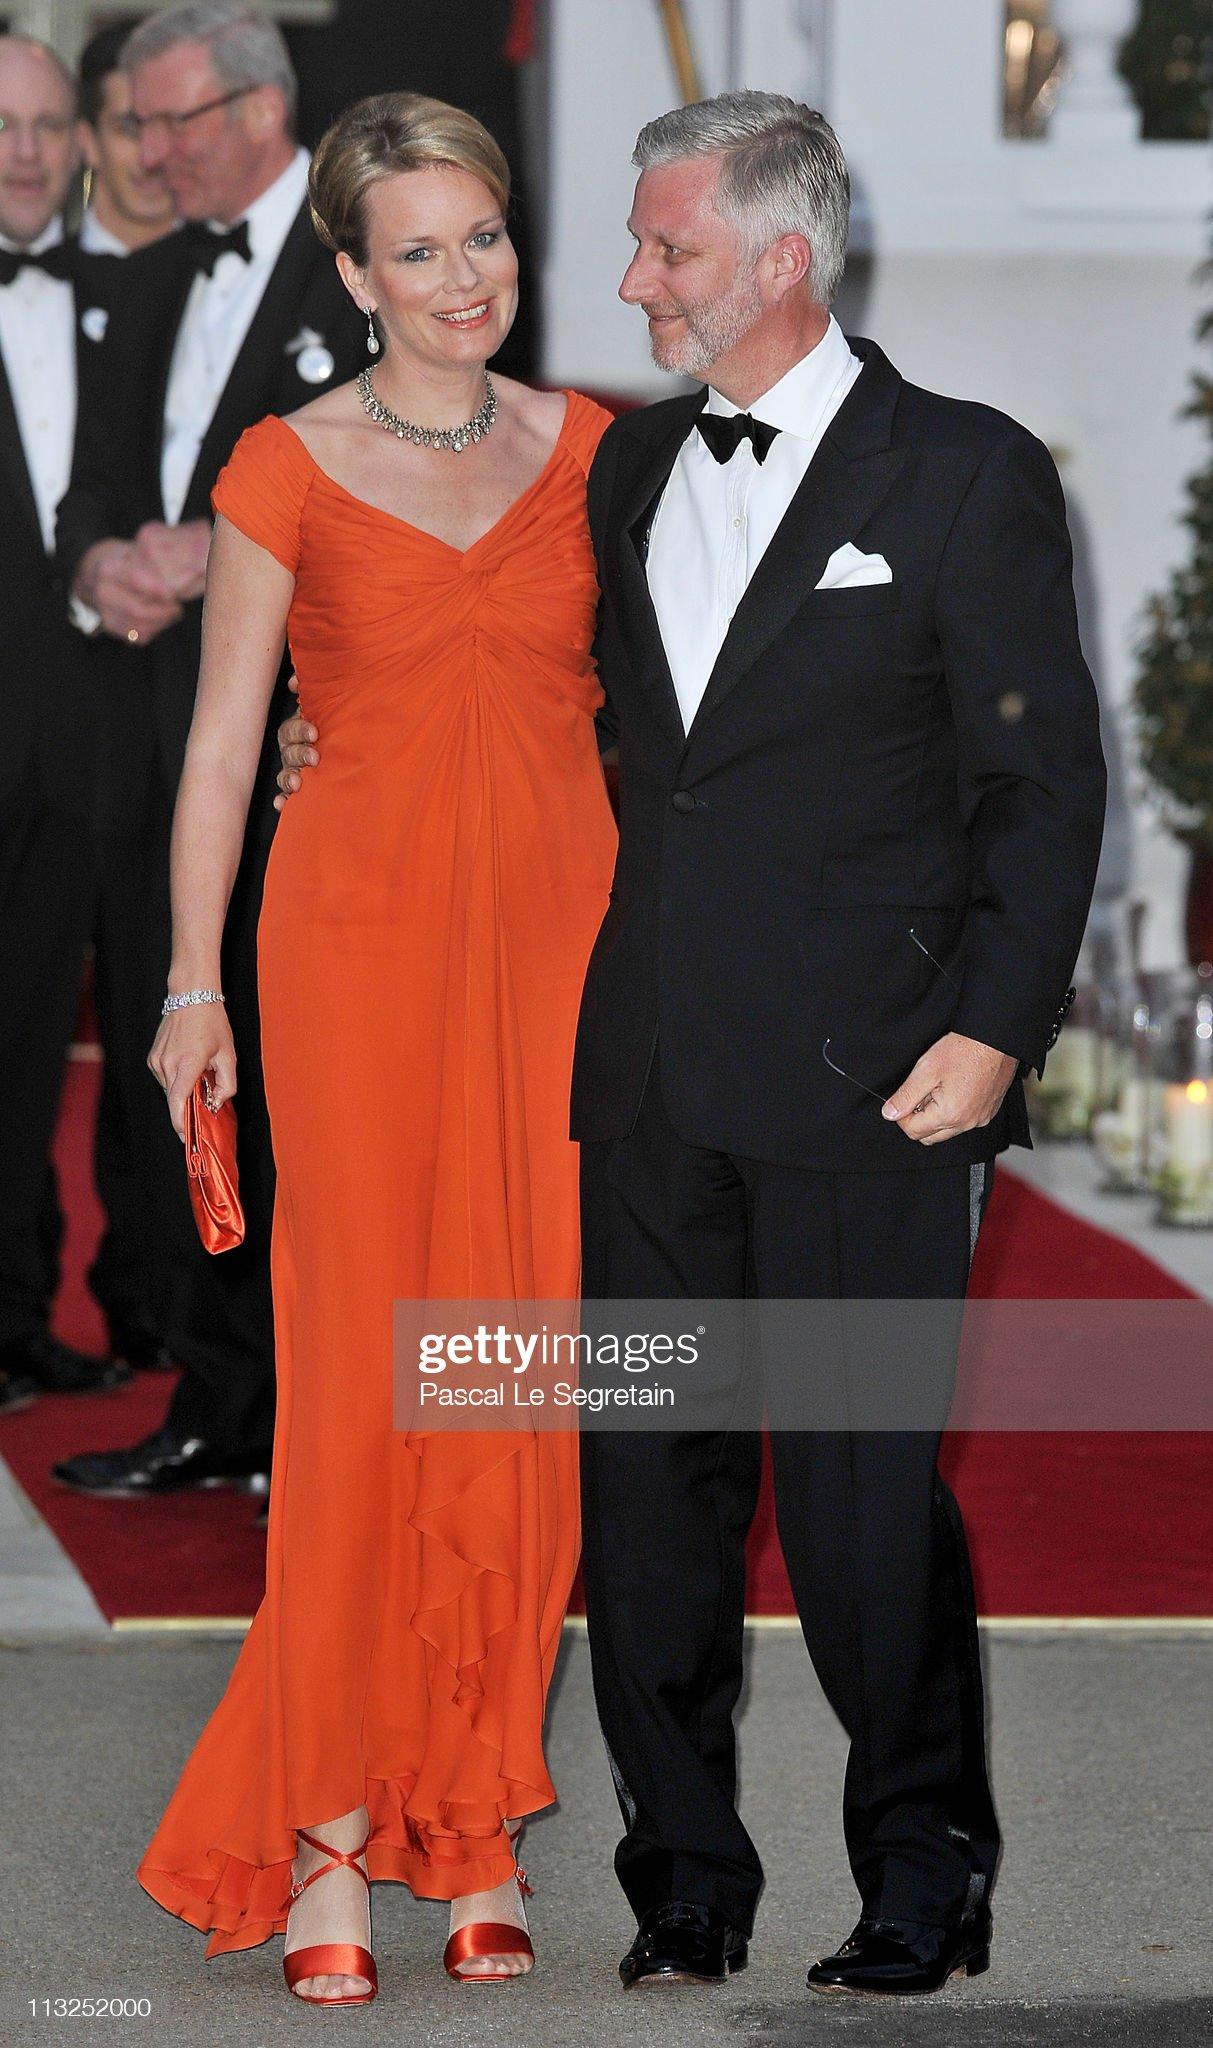 Вечерние наряды Королевы Матильды Royal Wedding - Pre-Wedding Dinner : News Photo